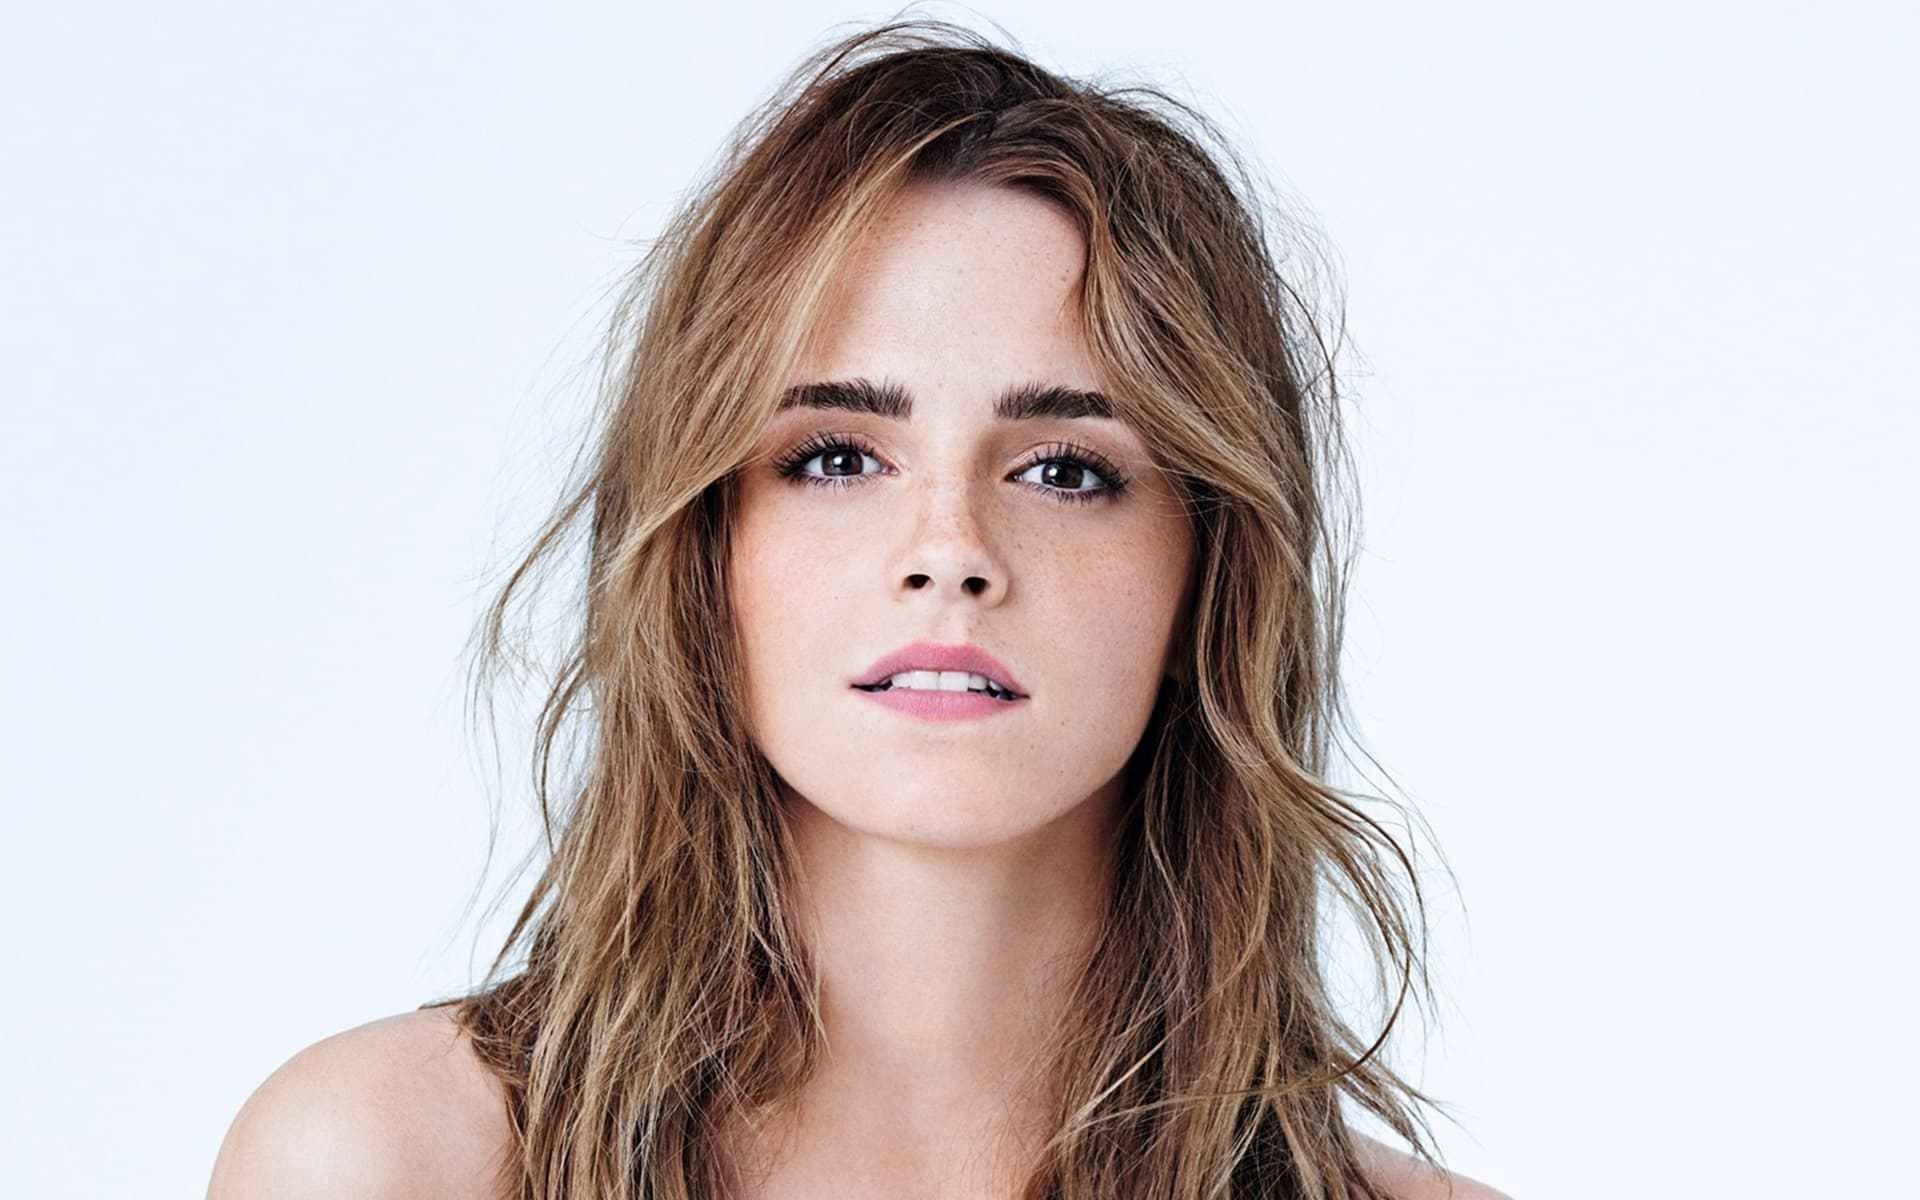 Emma Watson HD Wallpapers 1080p (75+ images)